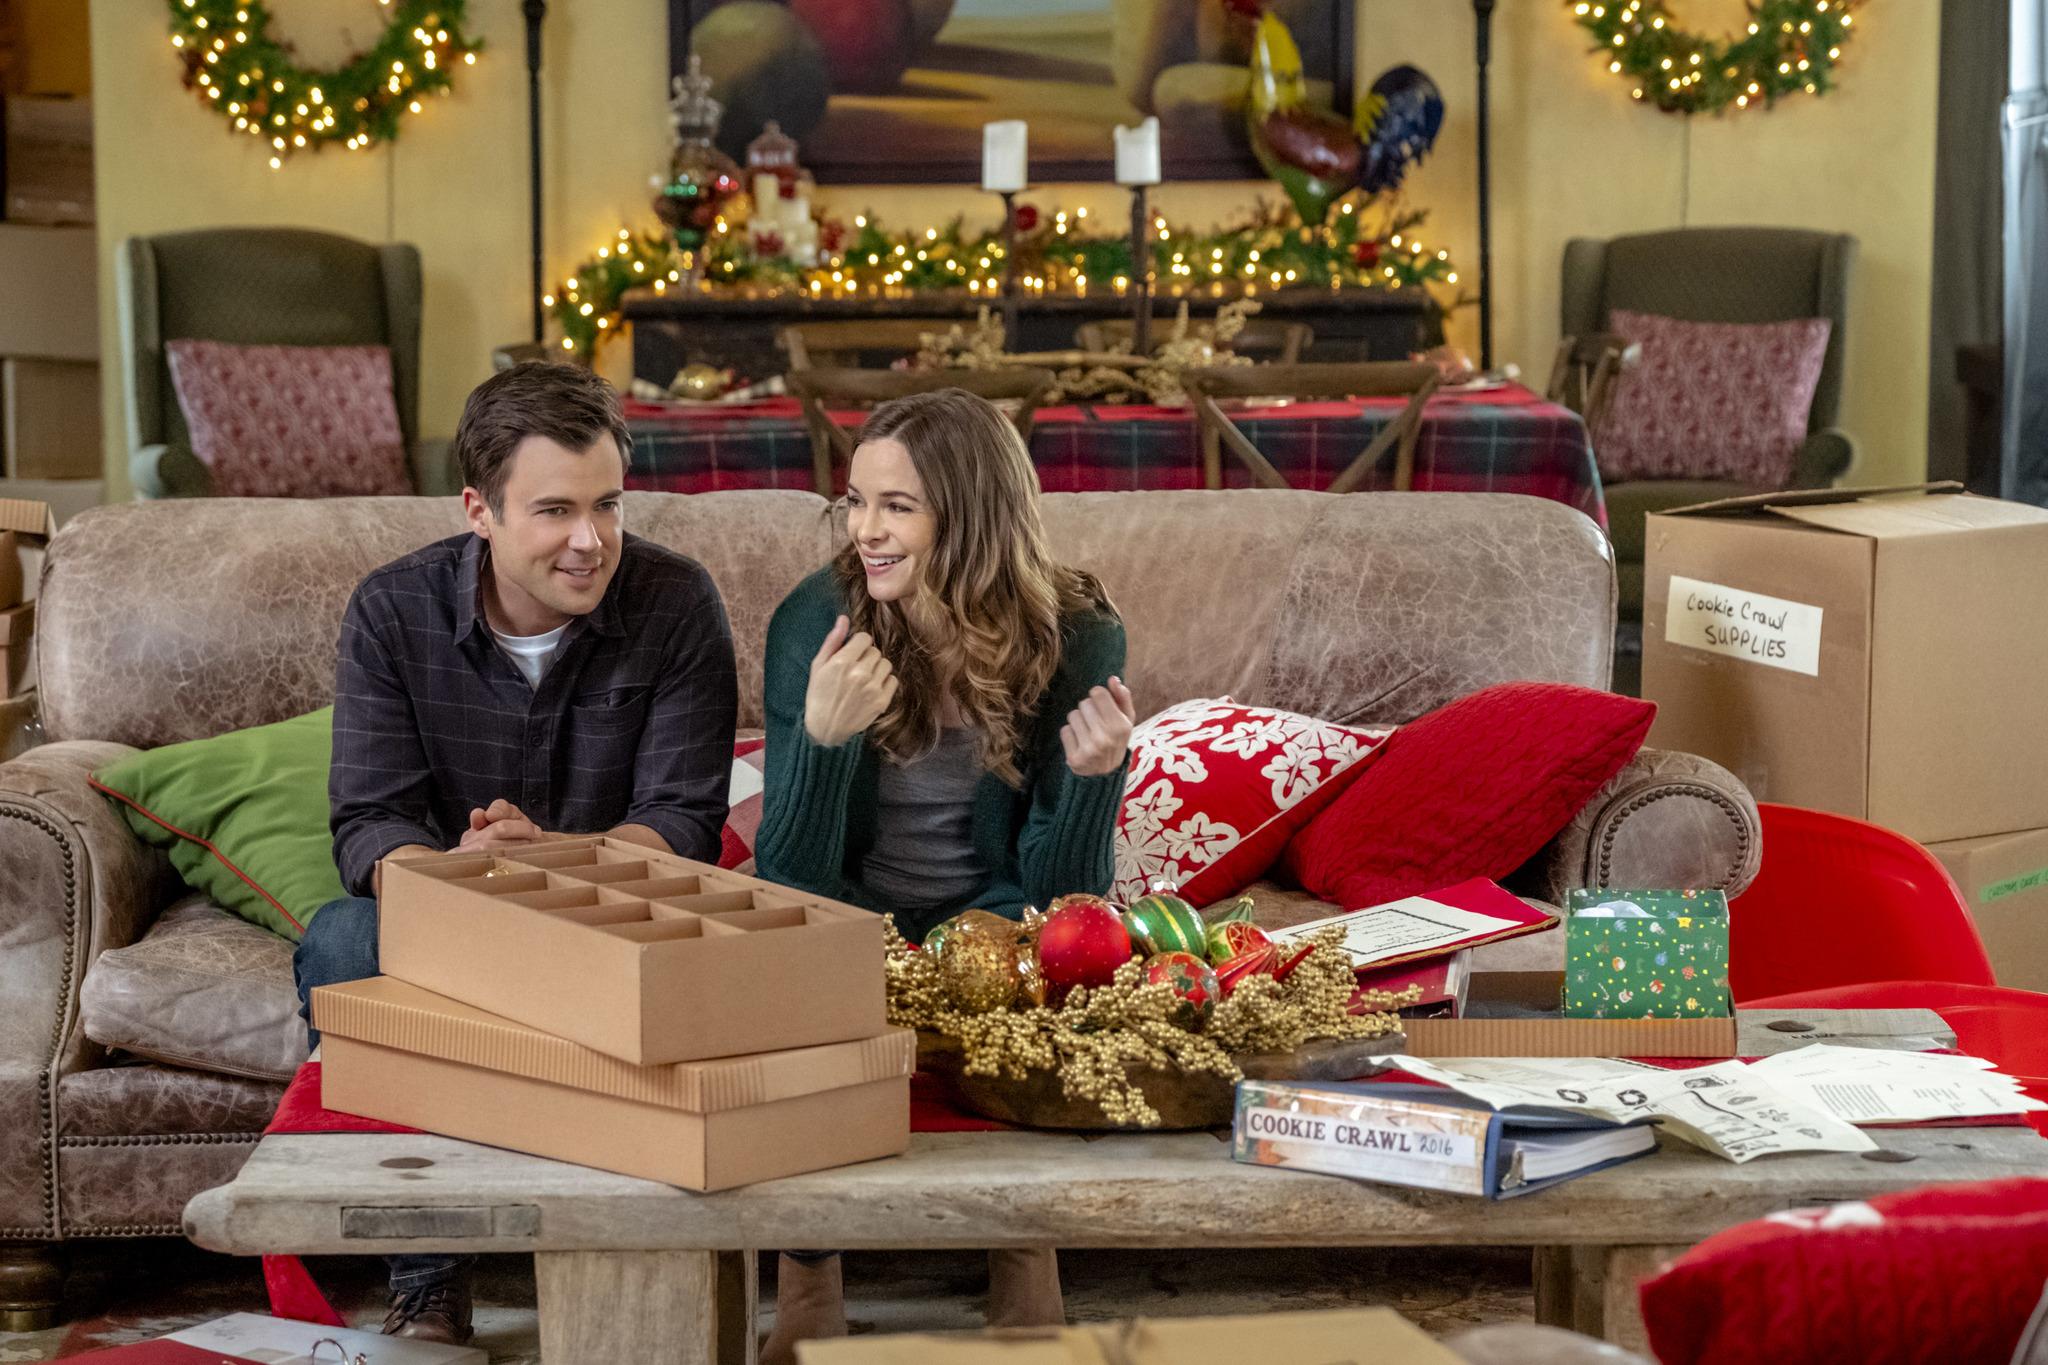 Danielle Panabaker and Matt Long in Christmas Joy (2018)